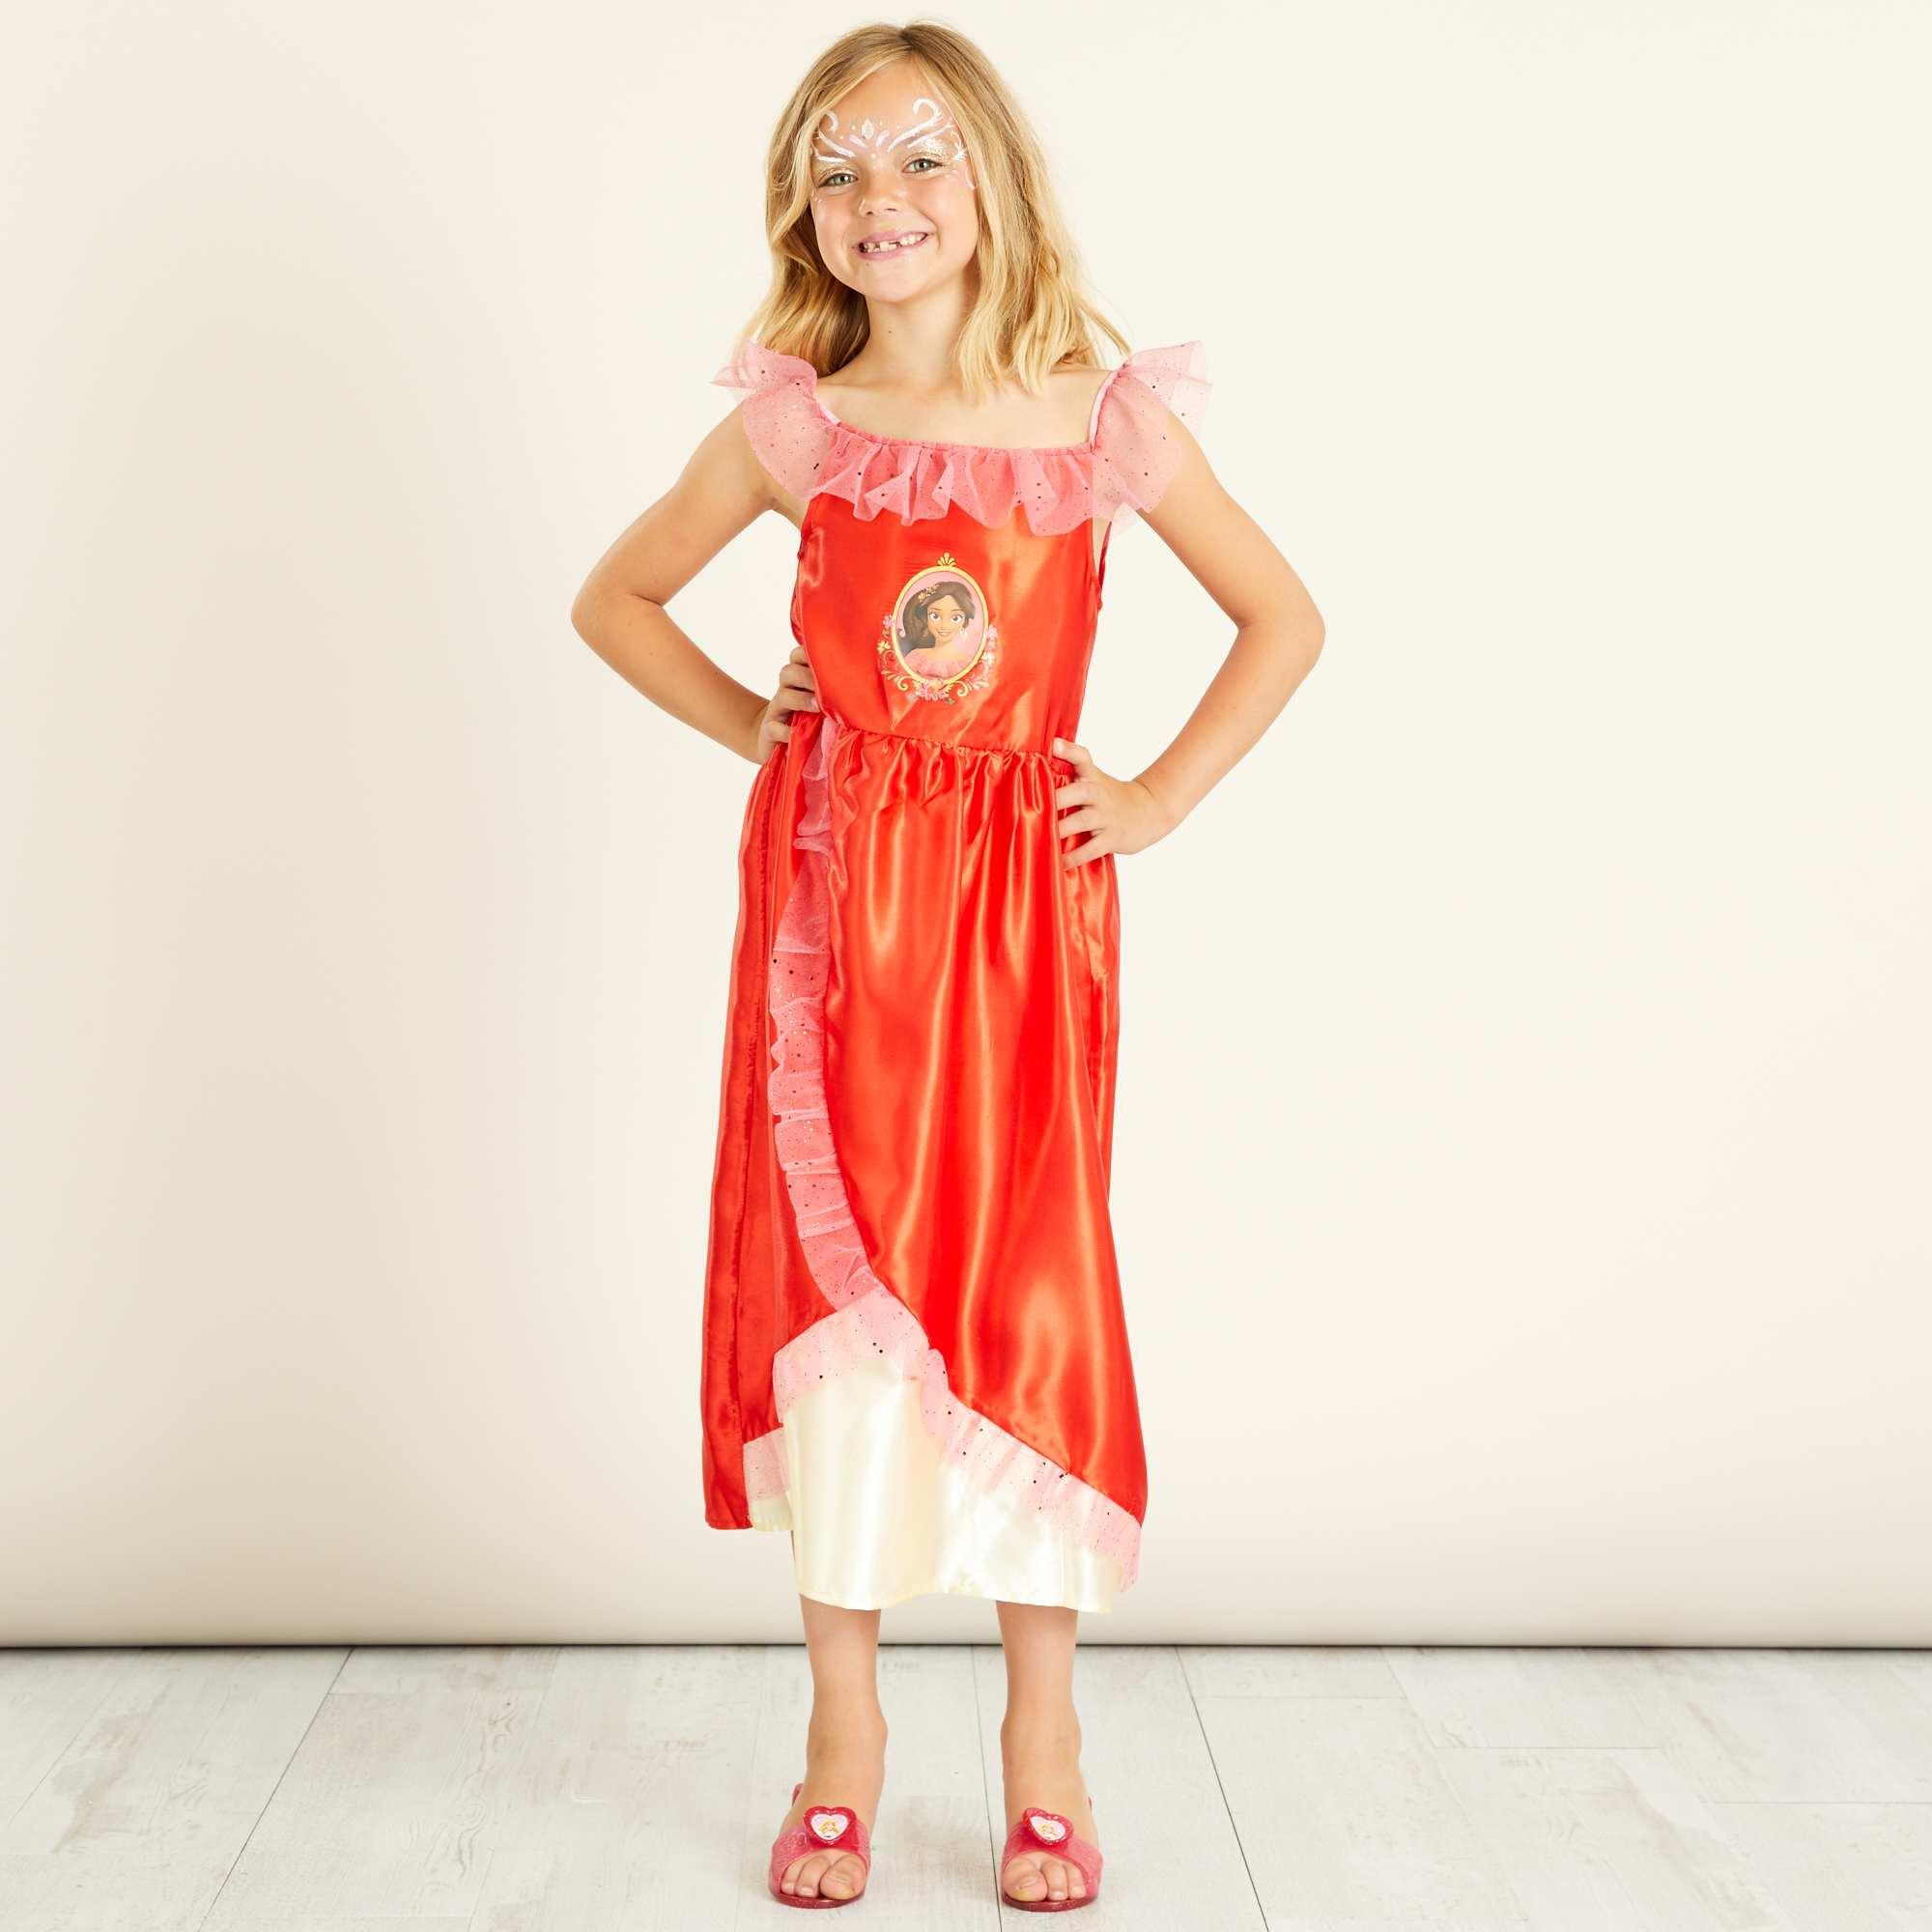 Top Costume principessa 'Elena d'Avalor' Bambini - rosso - Kiabi - 25,00€ UQ72